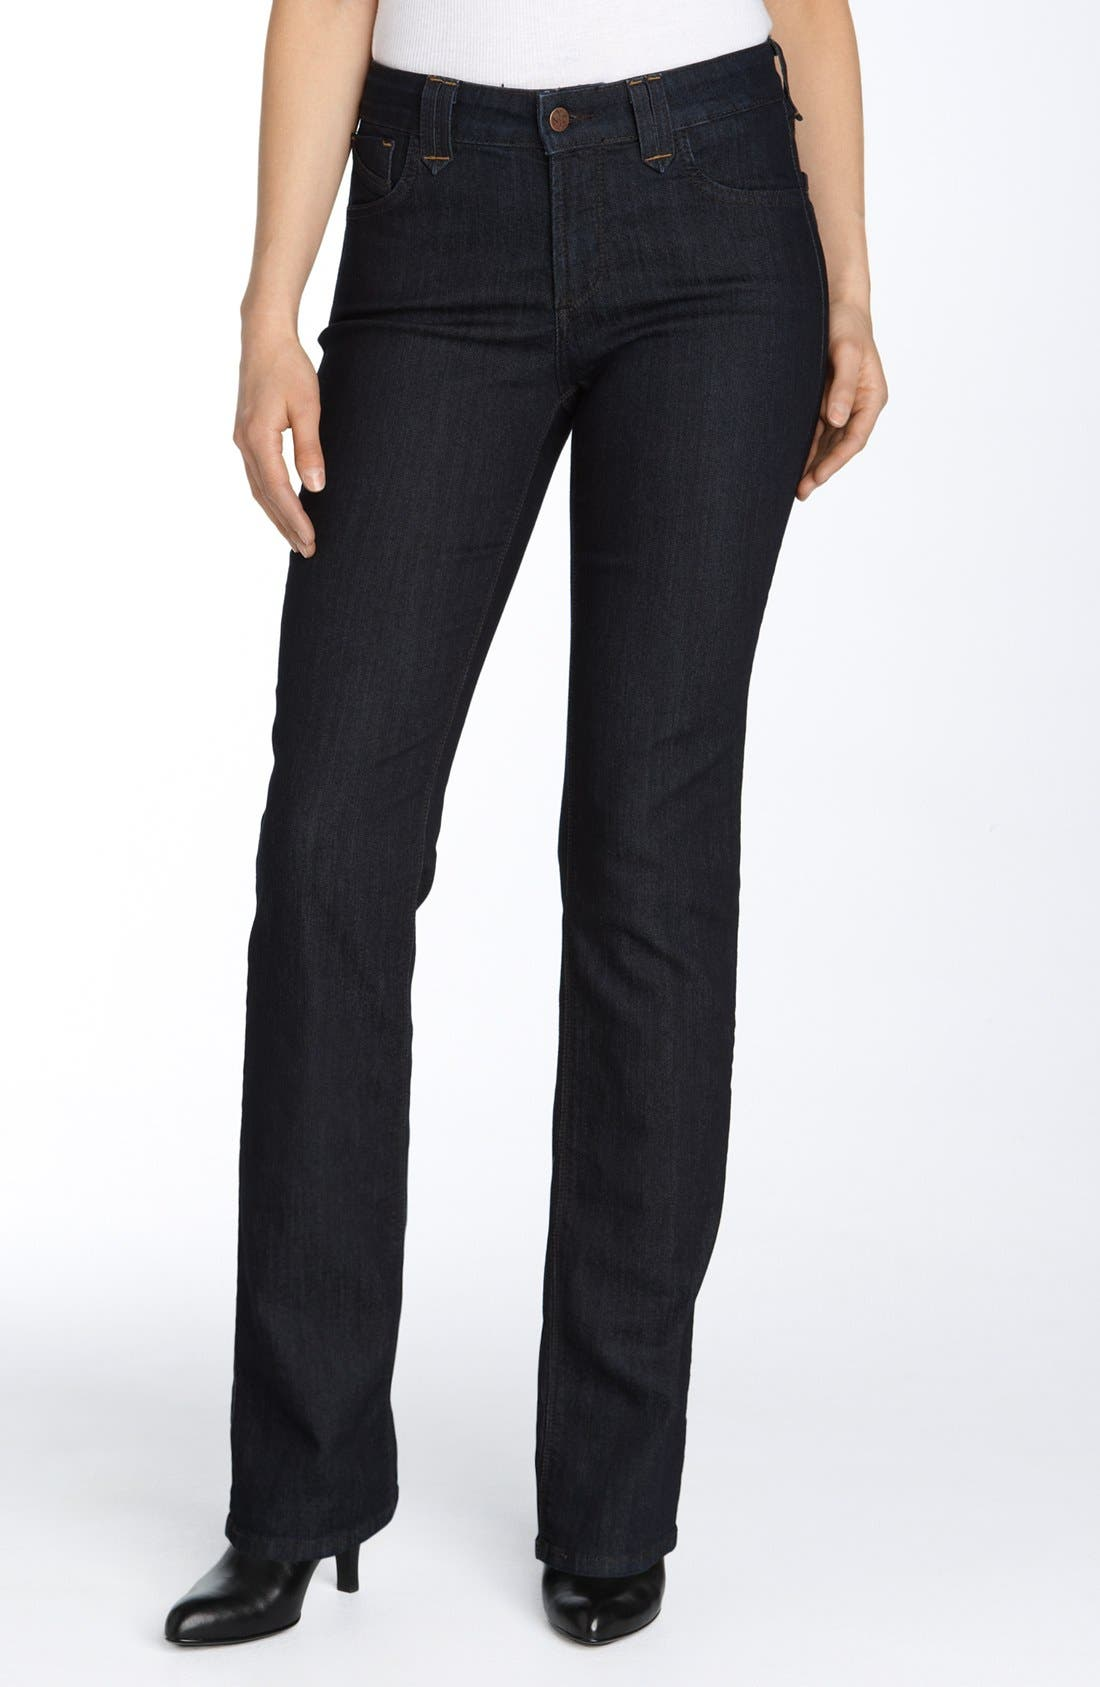 Main Image - NYDJ 'Marilyn' Stretch Straight Leg Jeans (Petite)